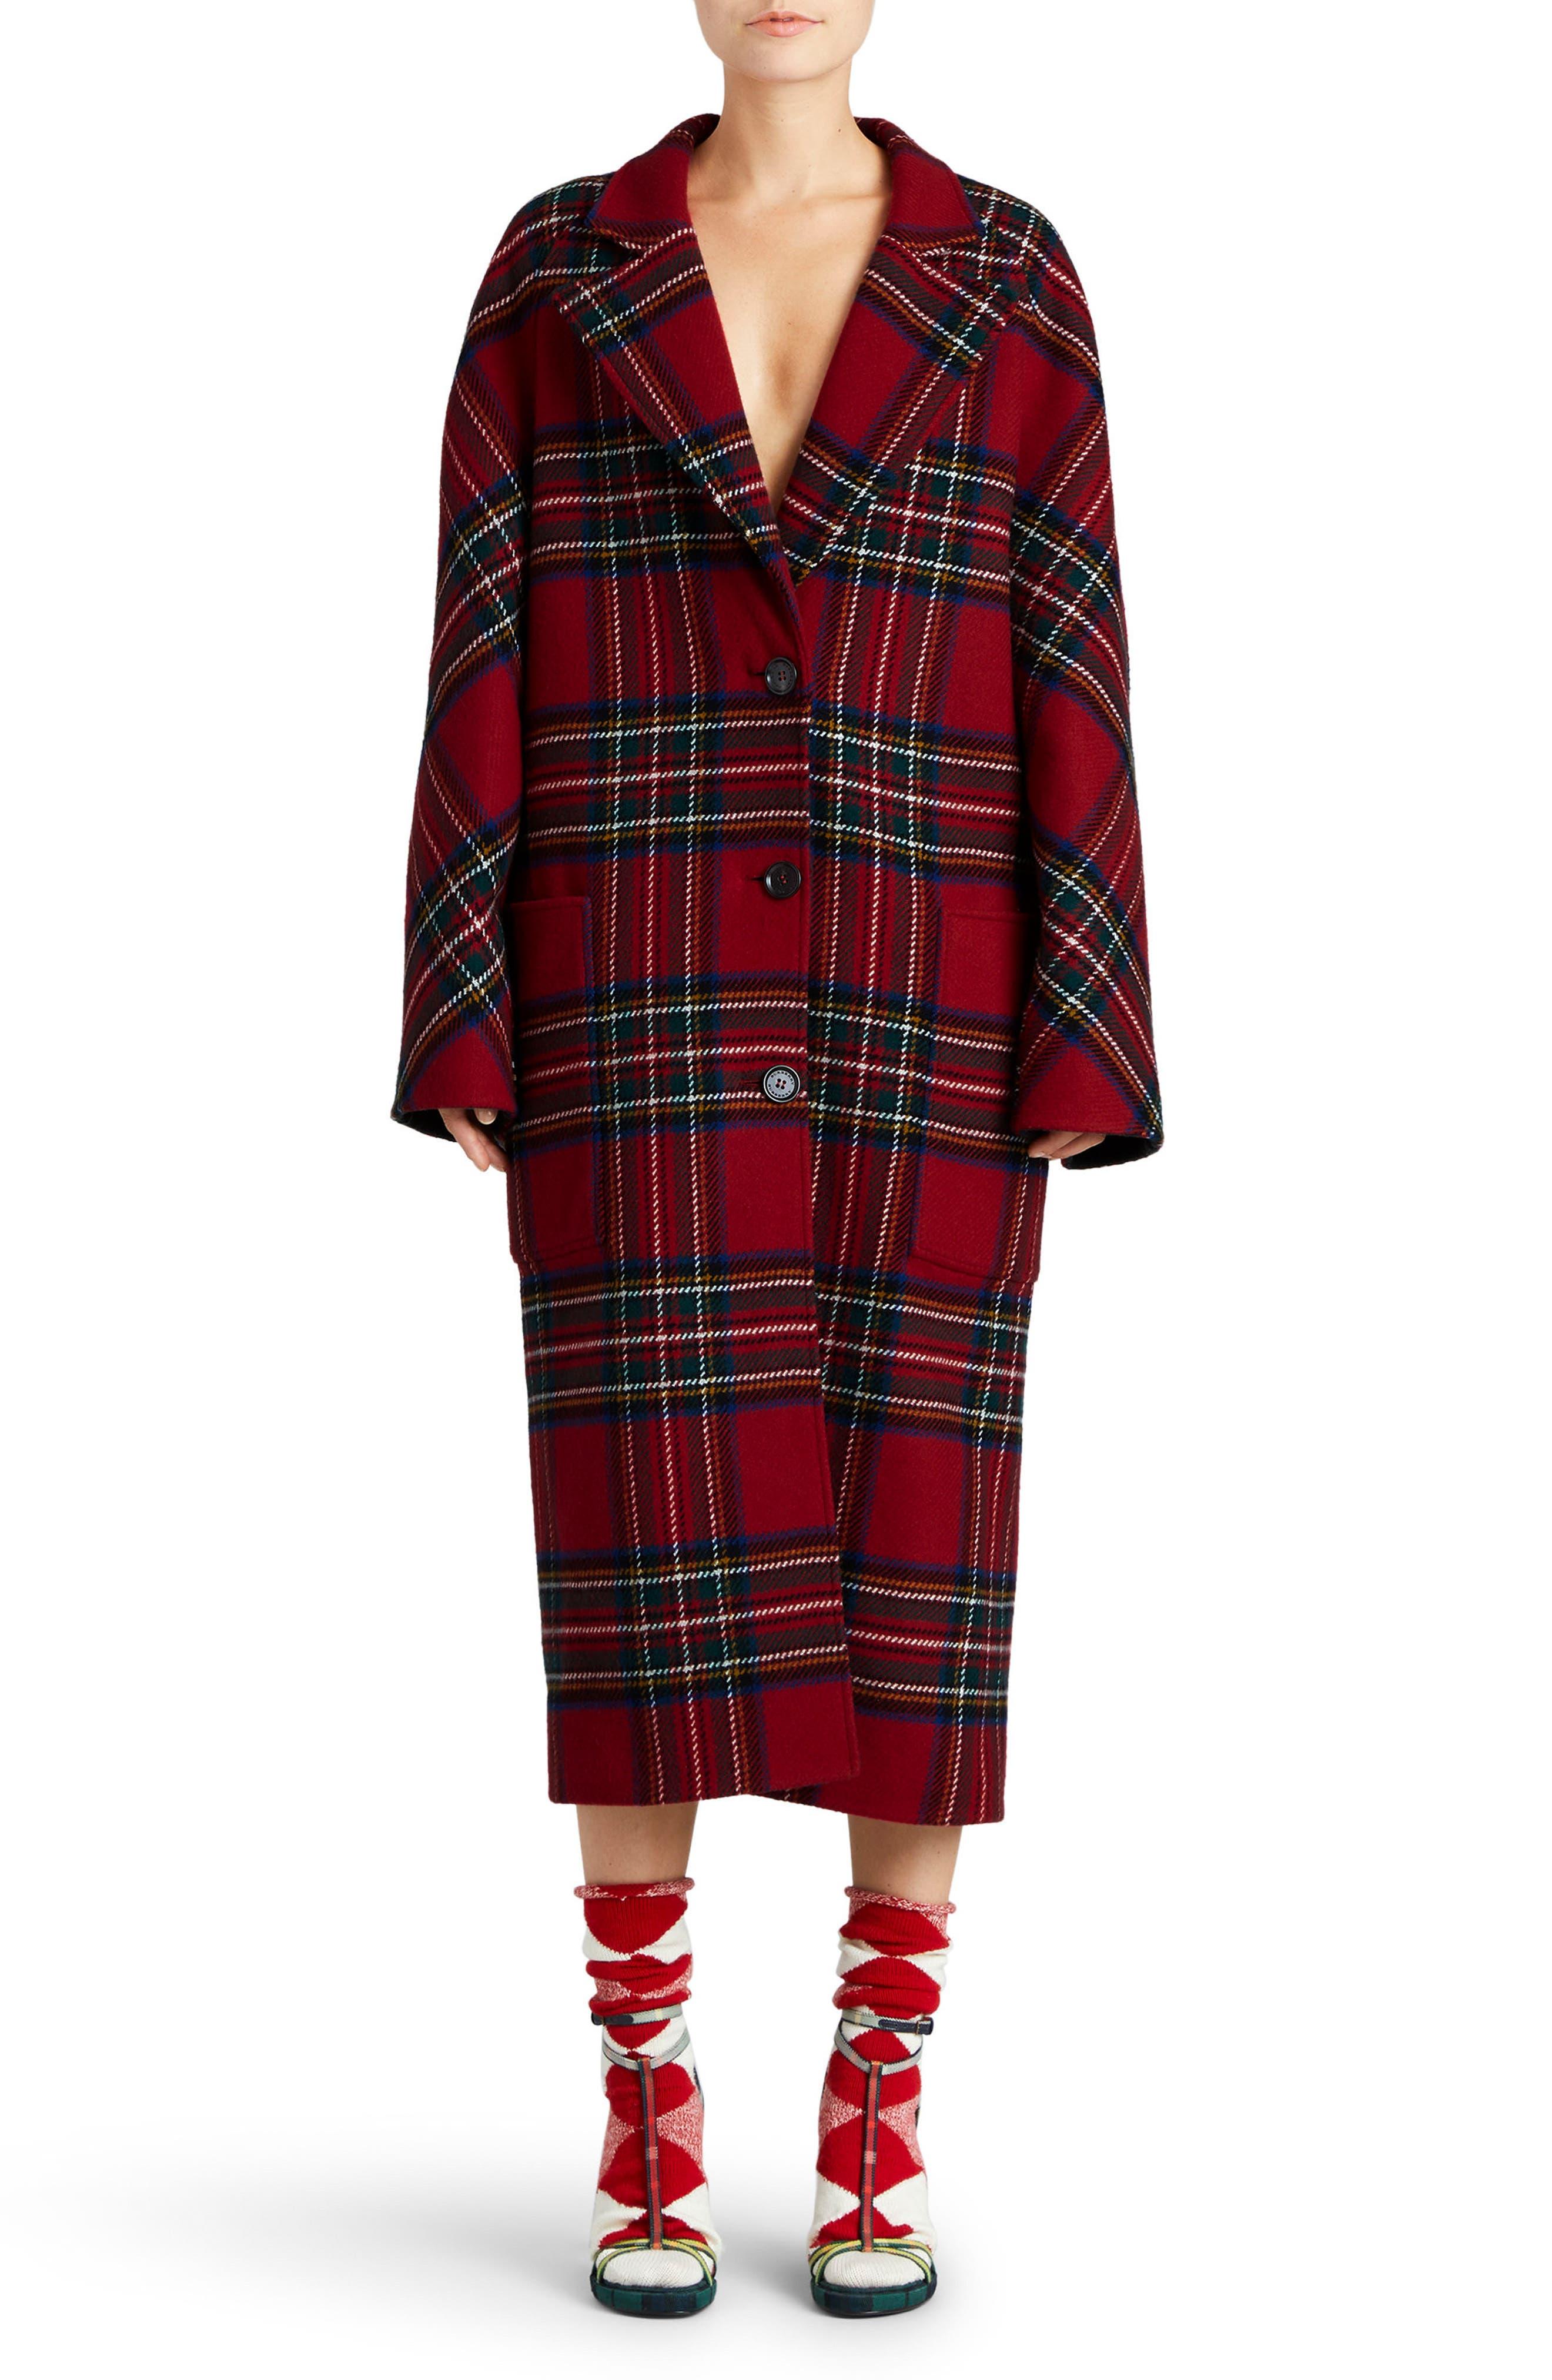 Burberry Scottish Tartan Wool & Cashmere Reversible Coat